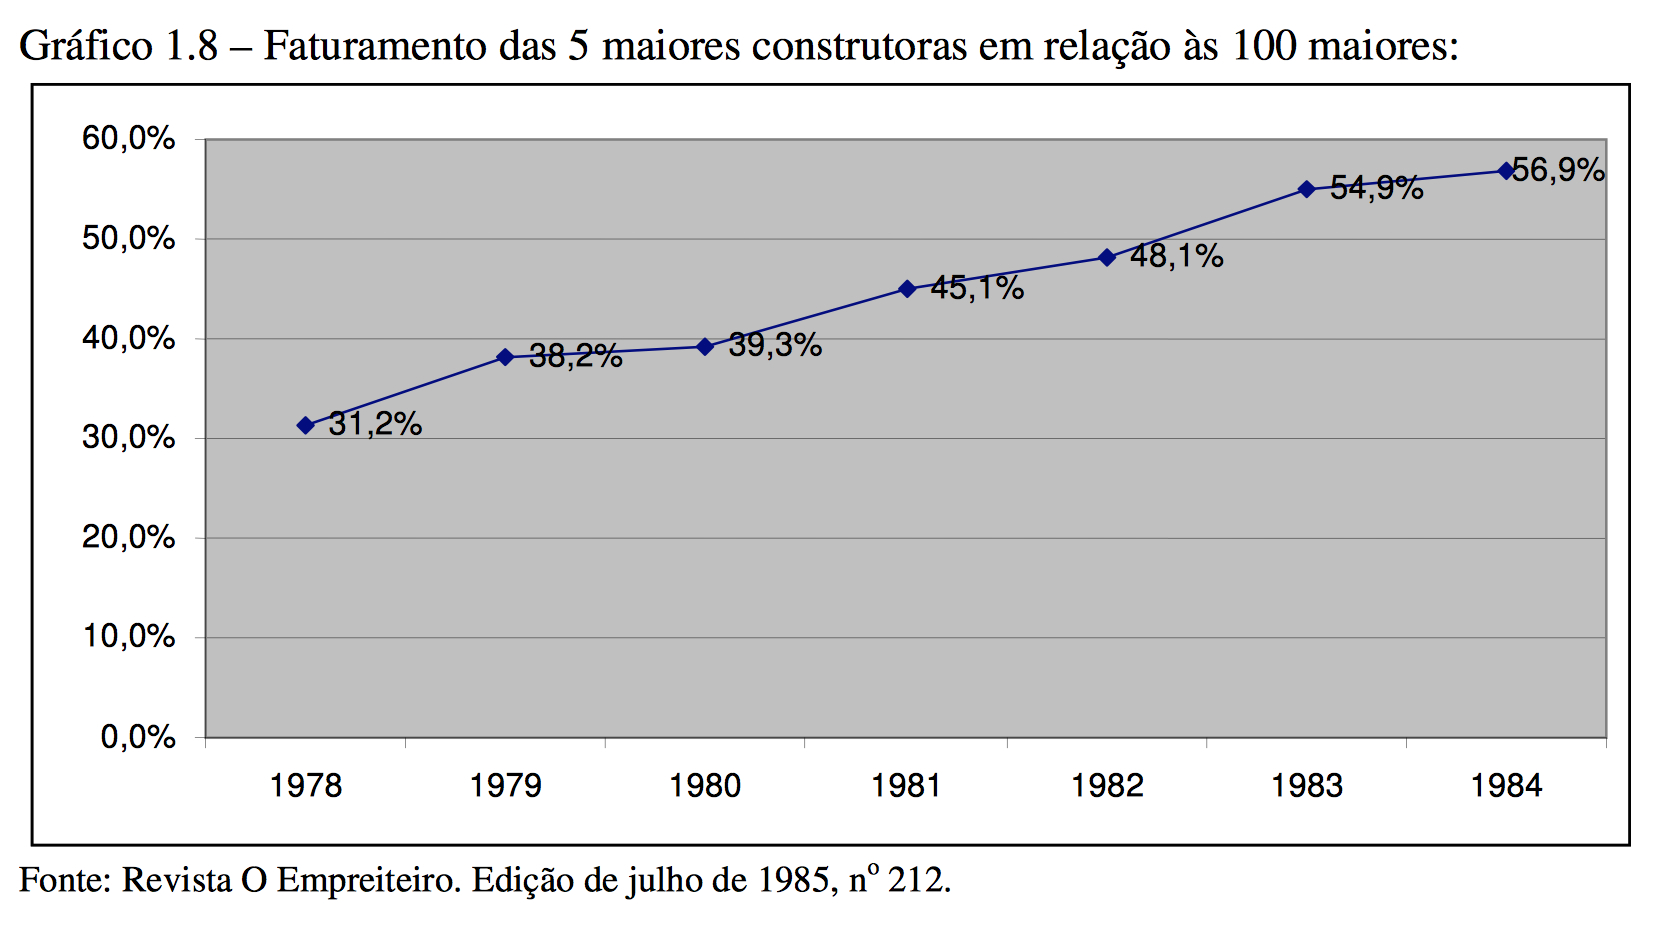 Ranking-concentracao-faturamento-5-maiores-empreiteiras